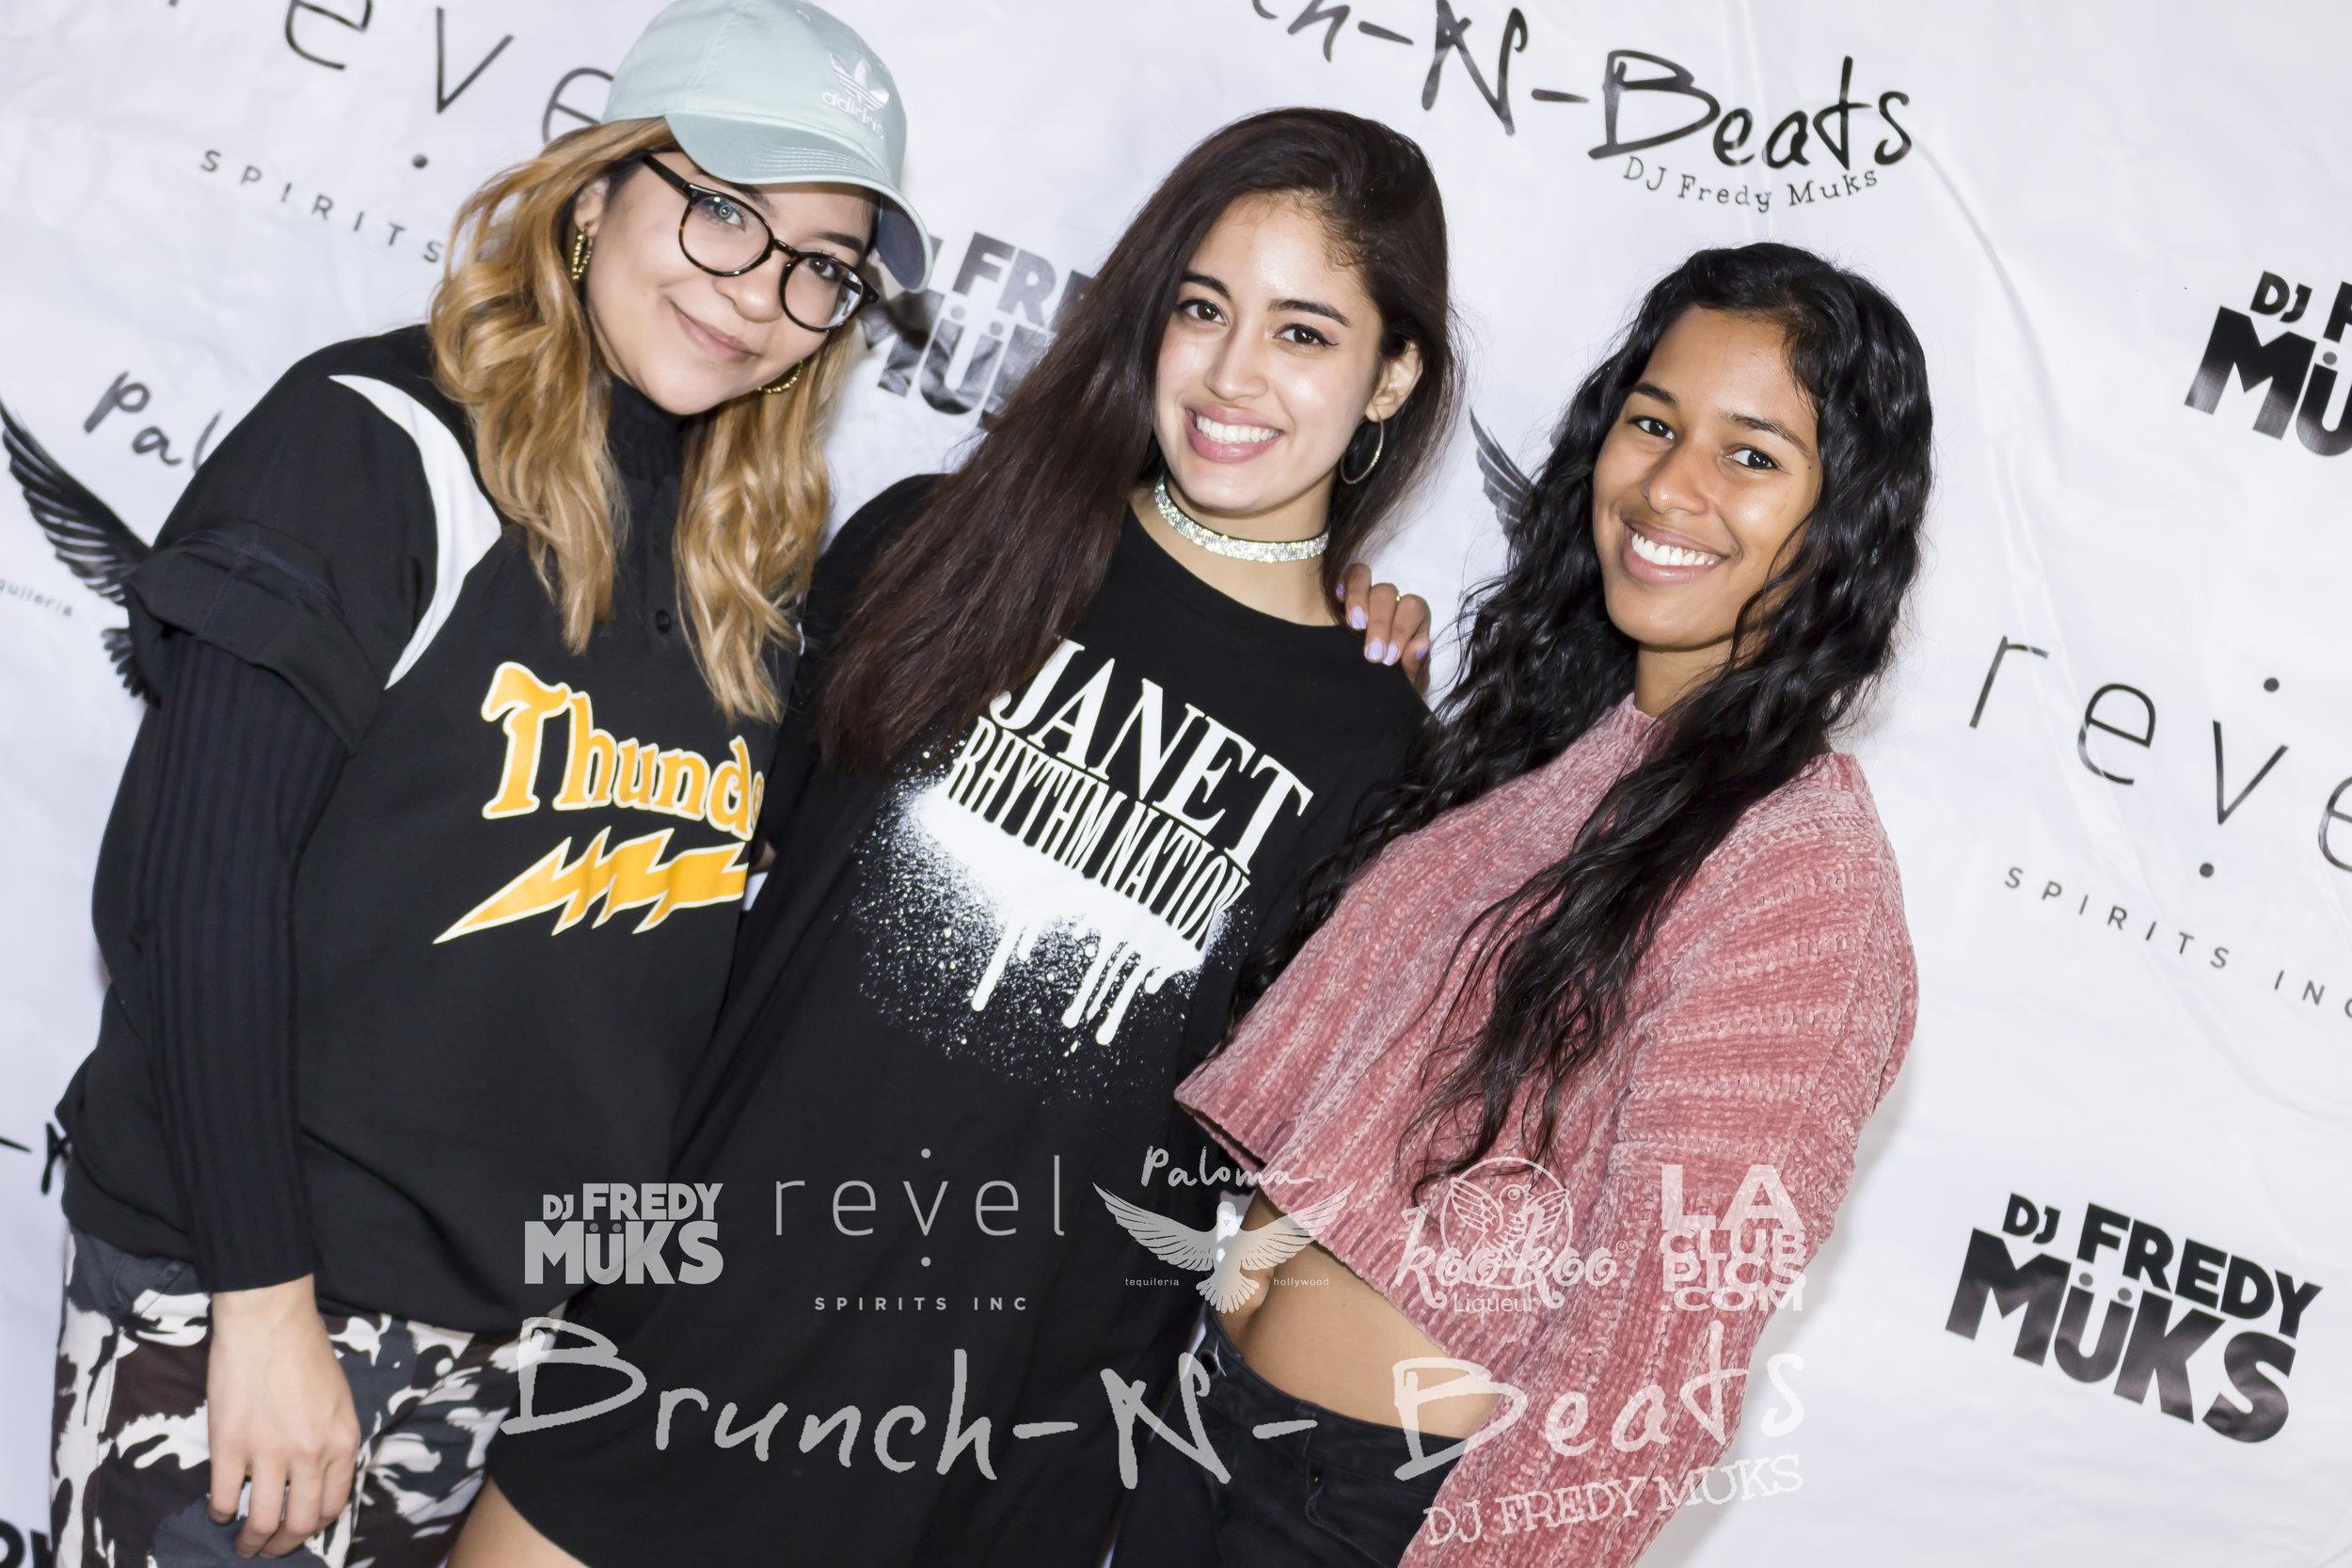 Brunch-N-Beats - 03-11-18_220.jpg